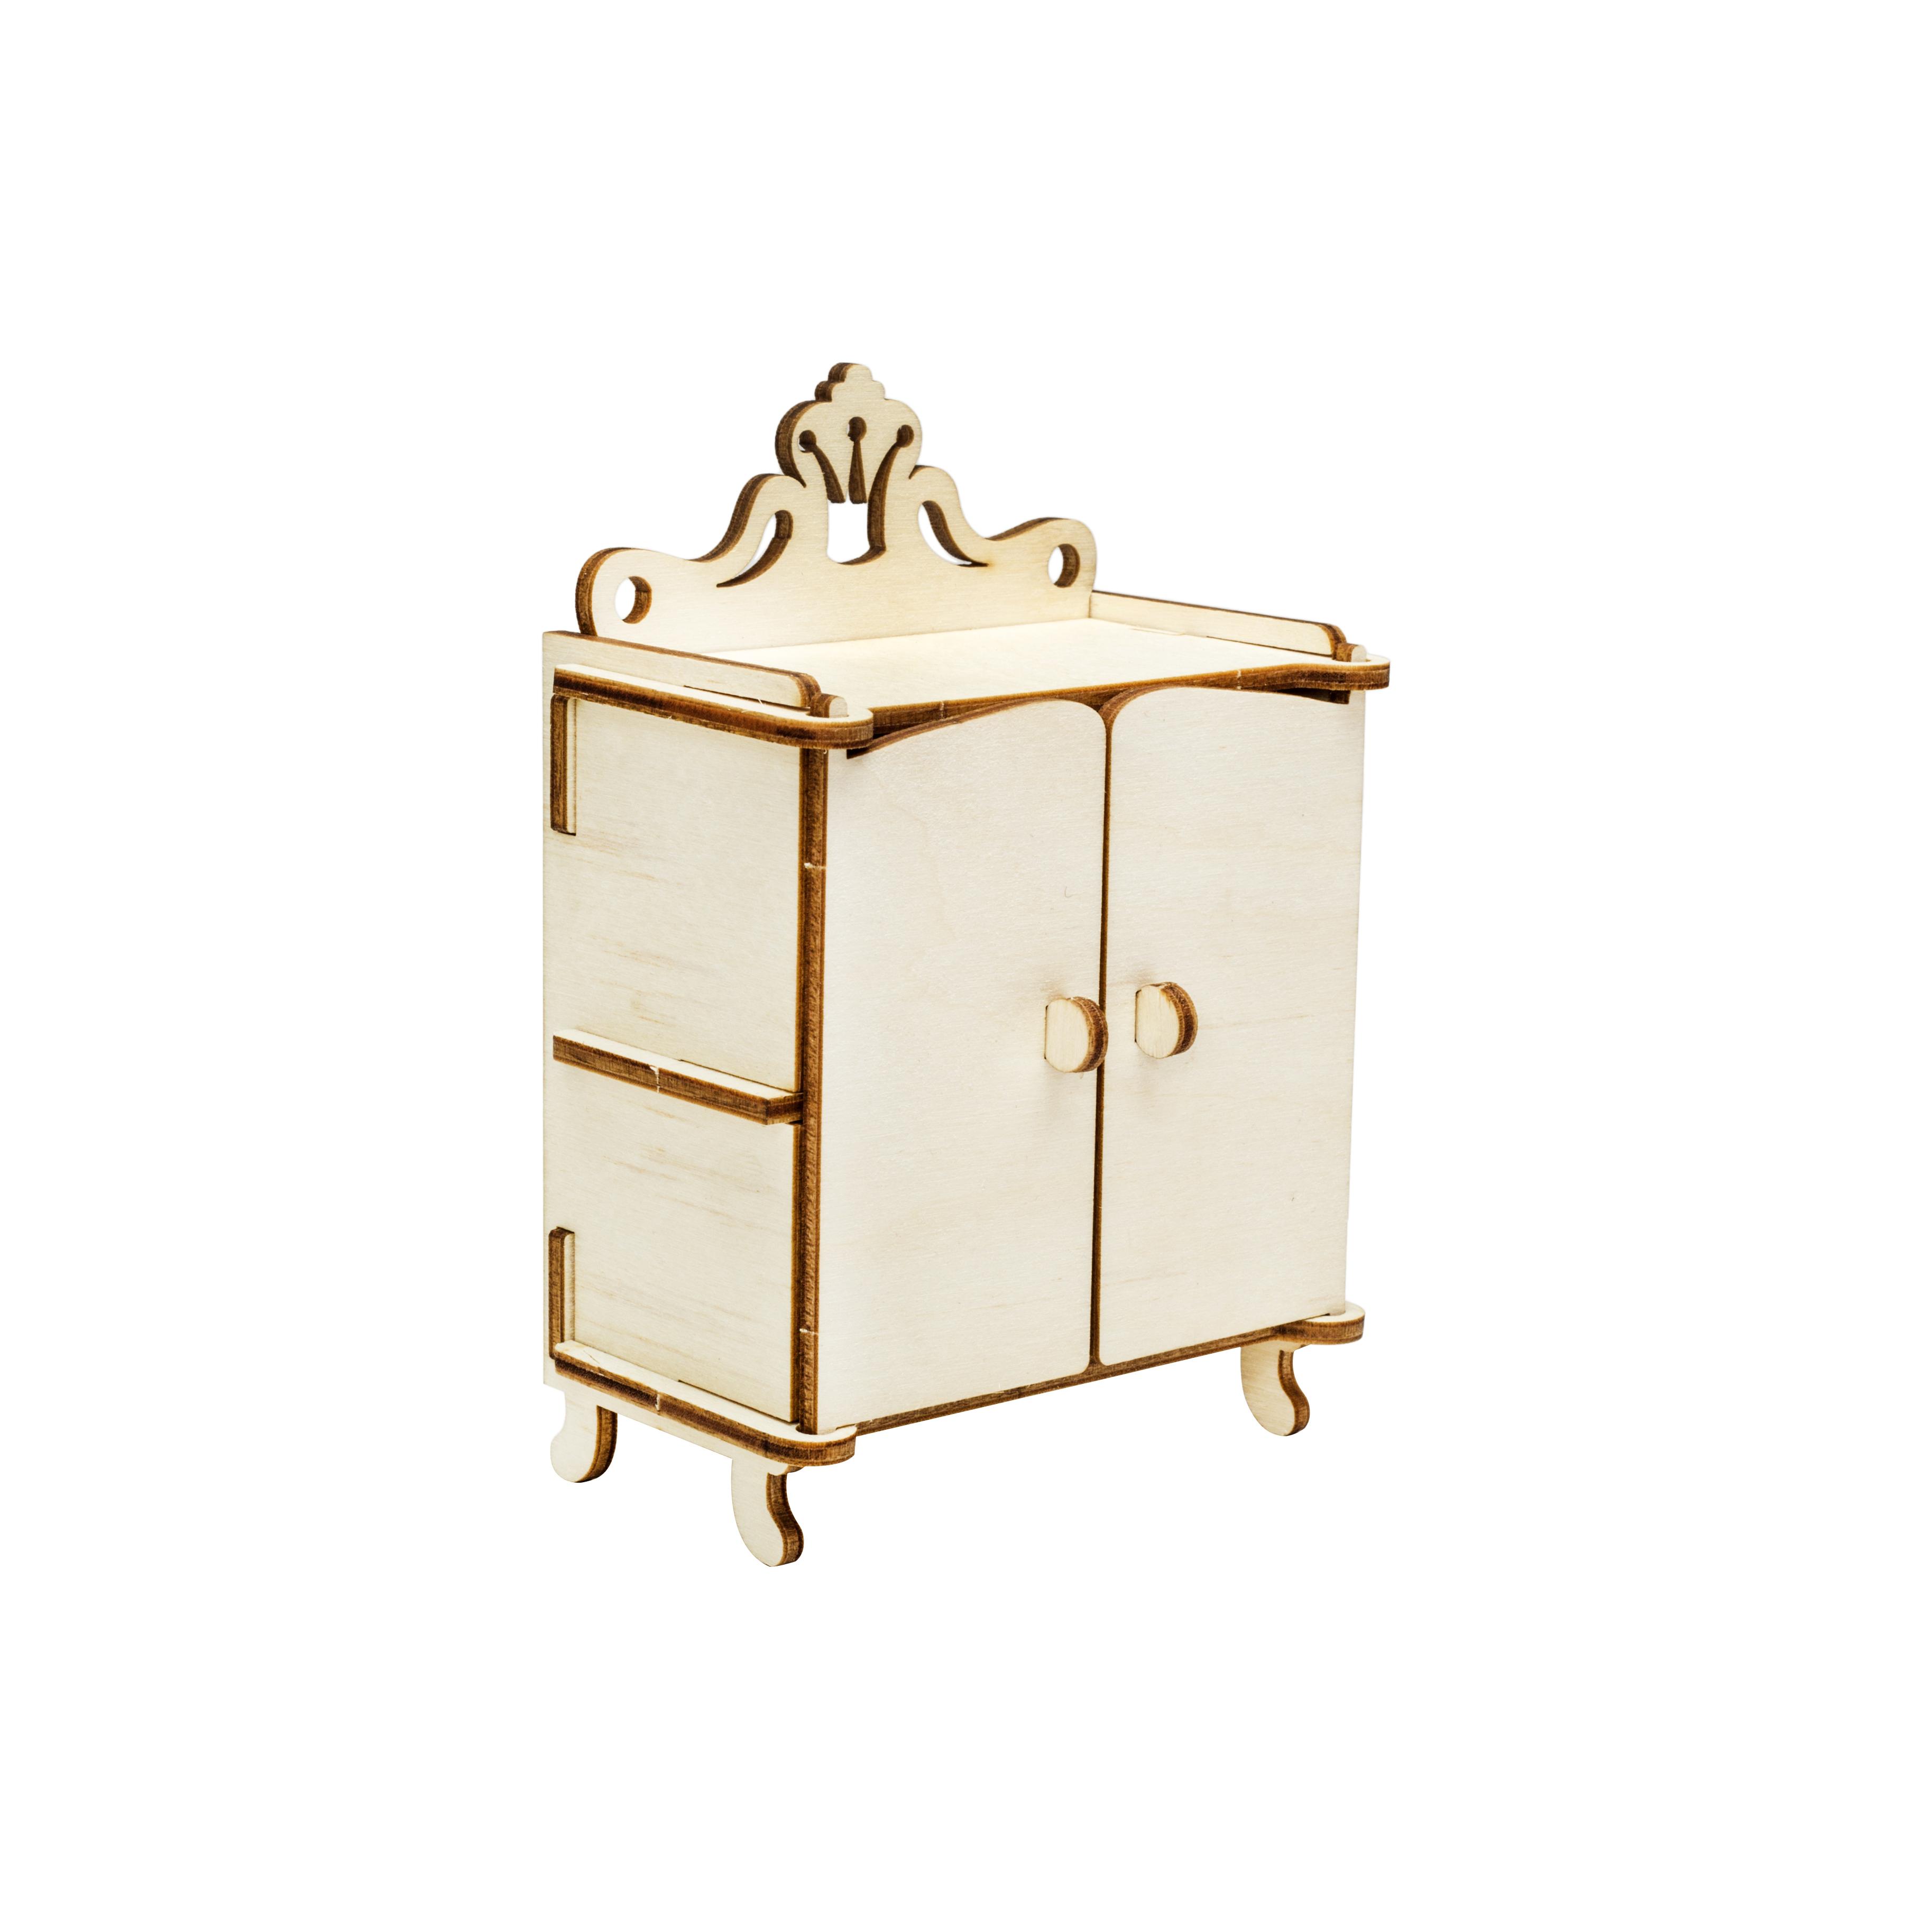 Мебель для кукол Iq Format в домик для кукол LOL, шкафчик бежевый